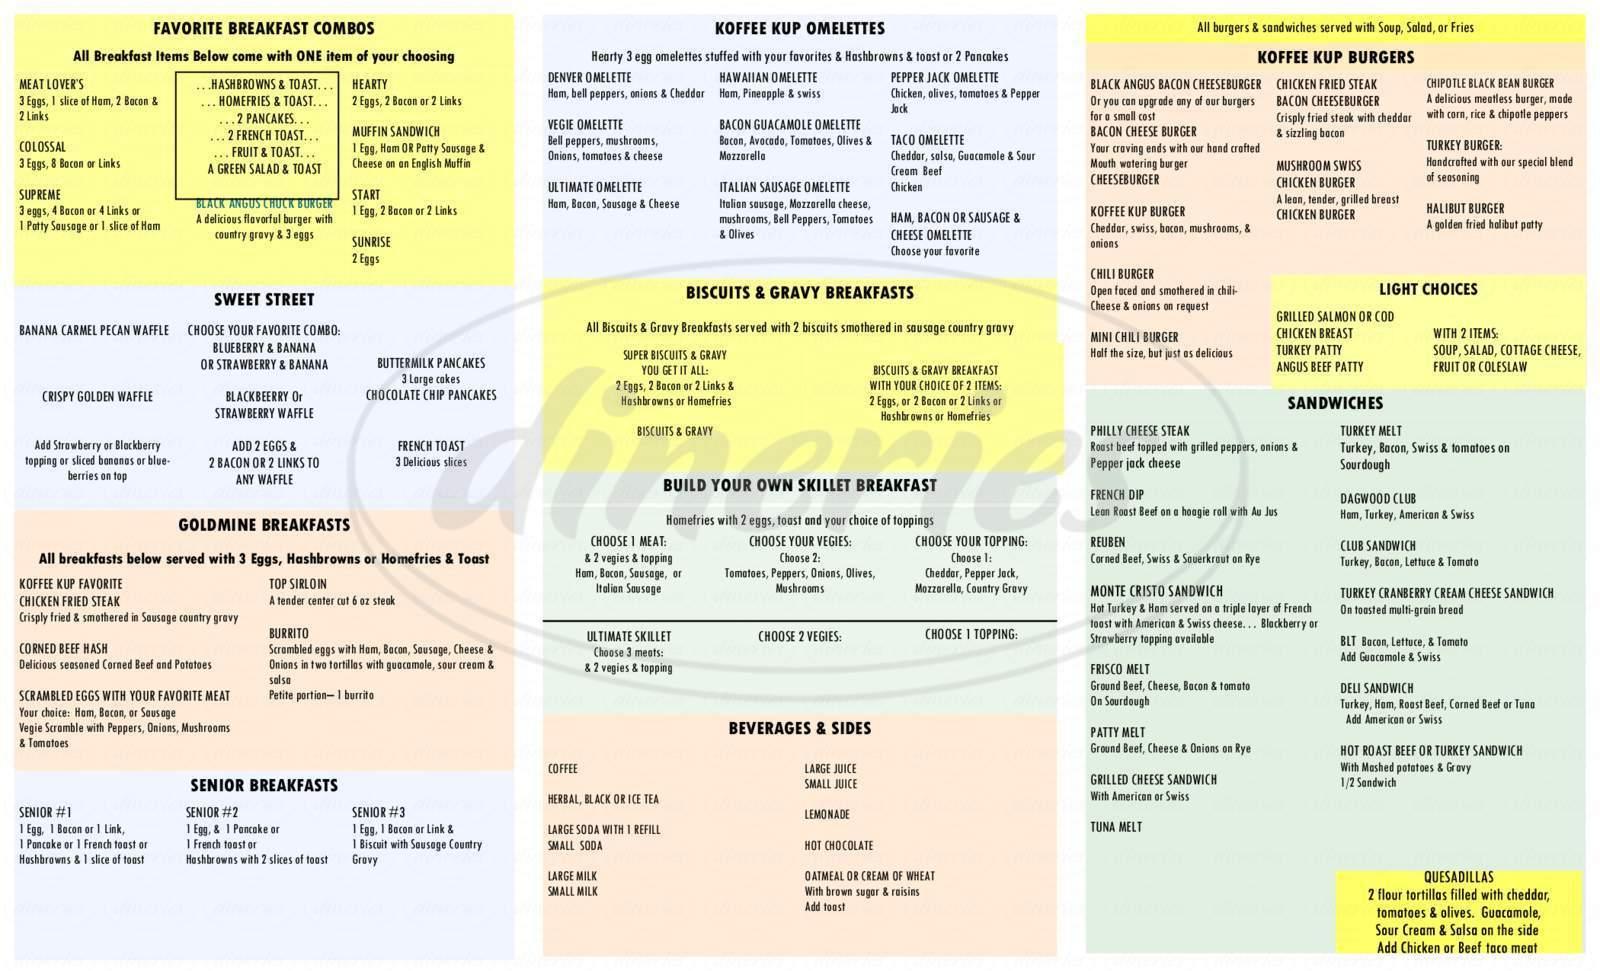 menu for Koffee Kup